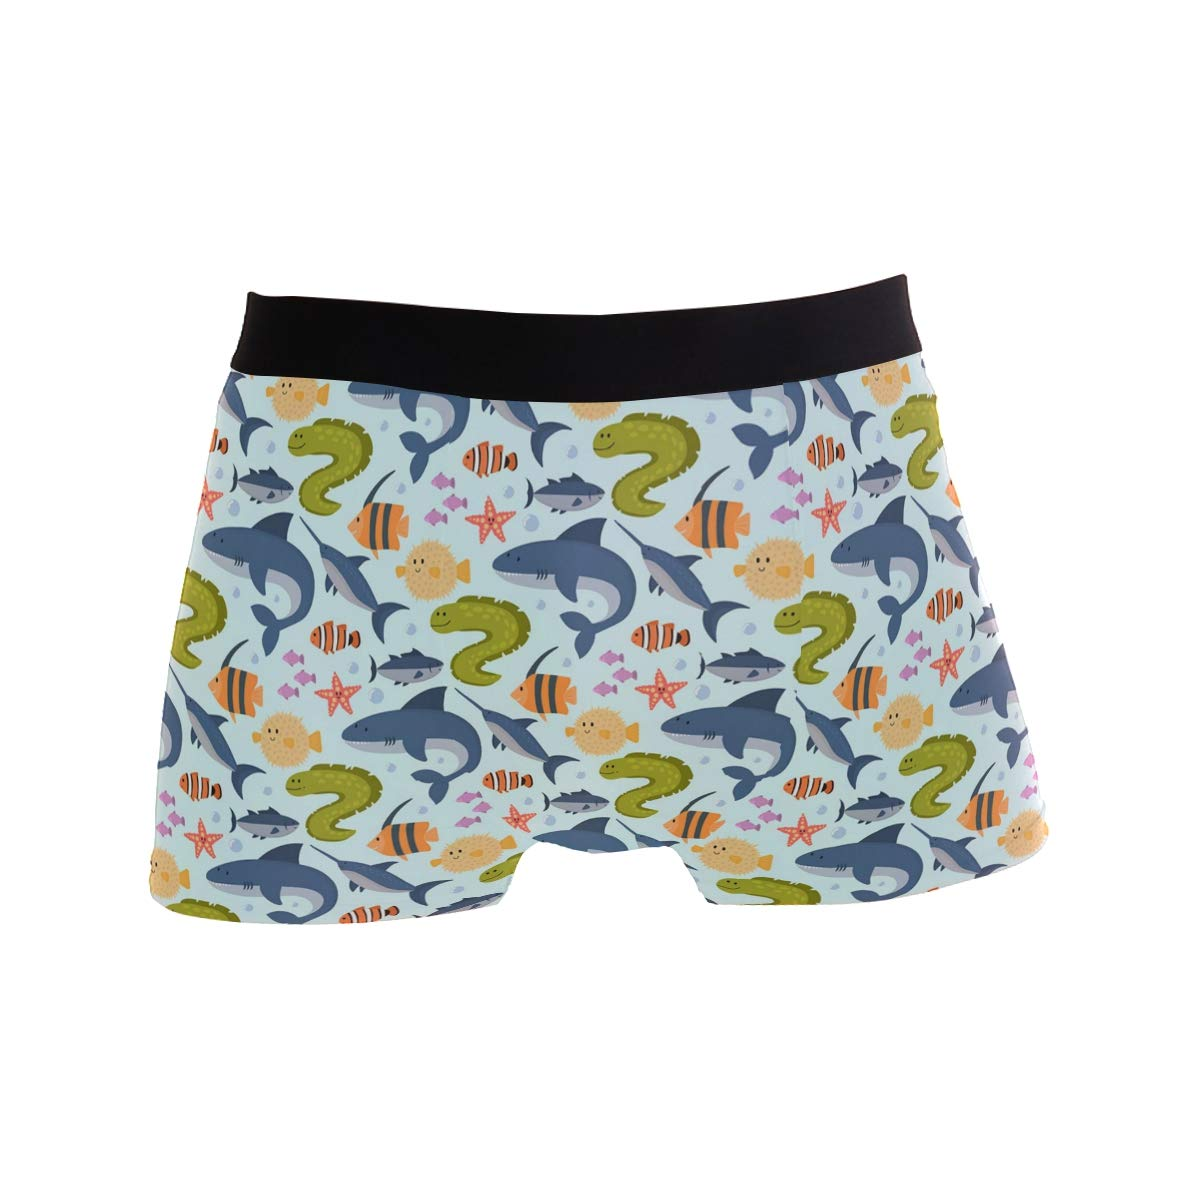 Mens Soft Breathable Whale Shark Art Underwear Boxer Briefs